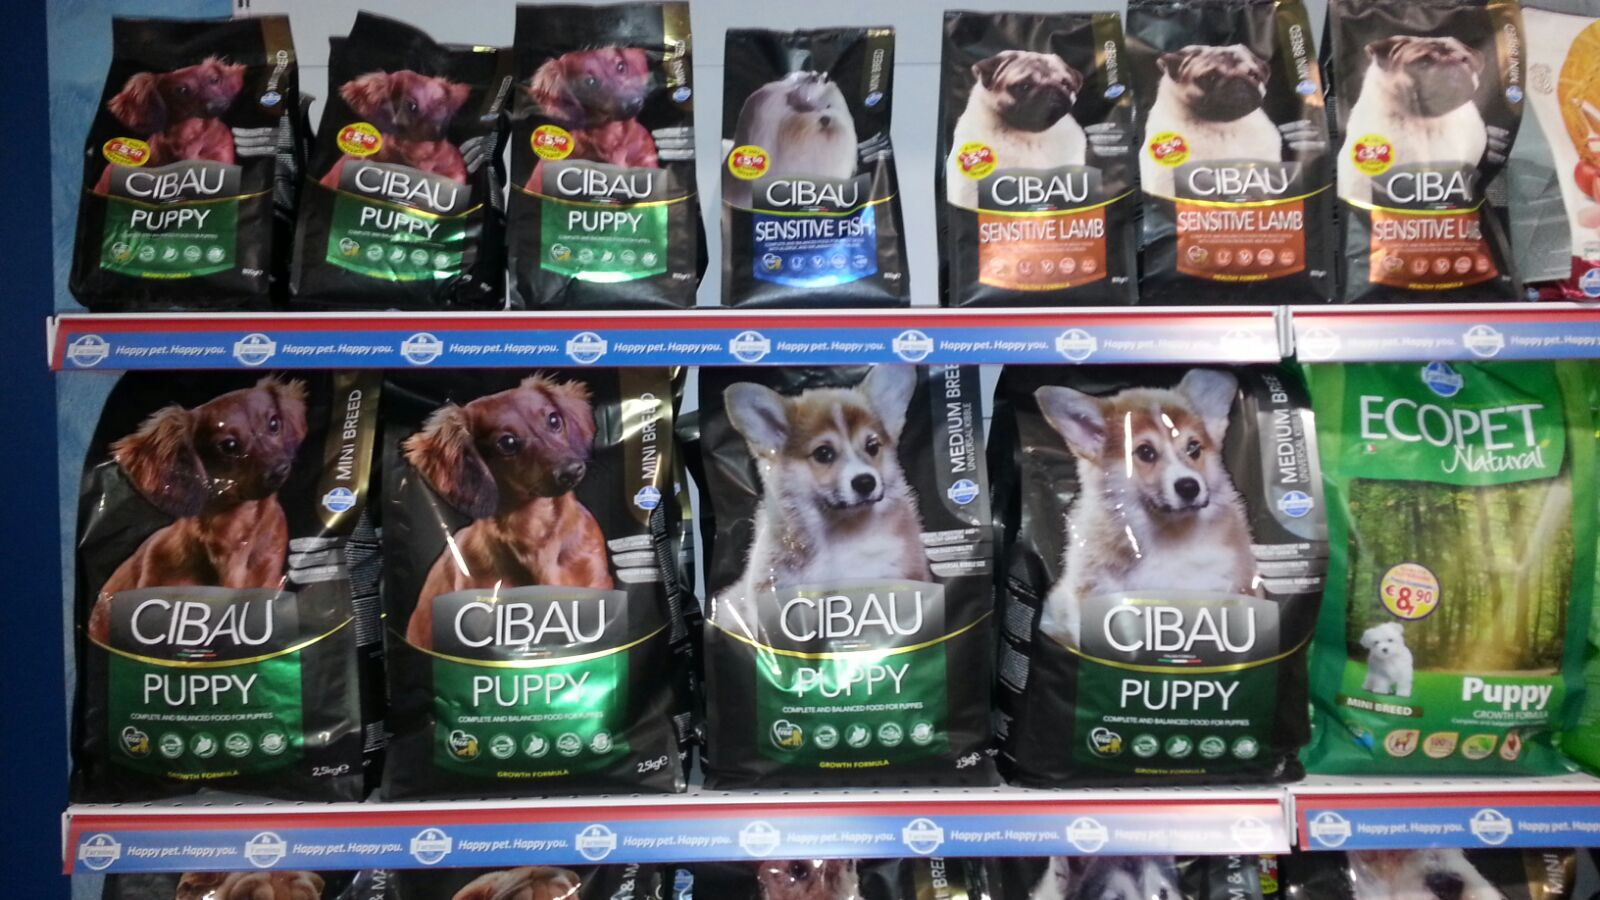 mangimi per animali da cortile, mangimi per animali, mangimi per animali domestici, mangimi per cani, mangimi per gatti, mangimi specifici, zootecnica, viterbo